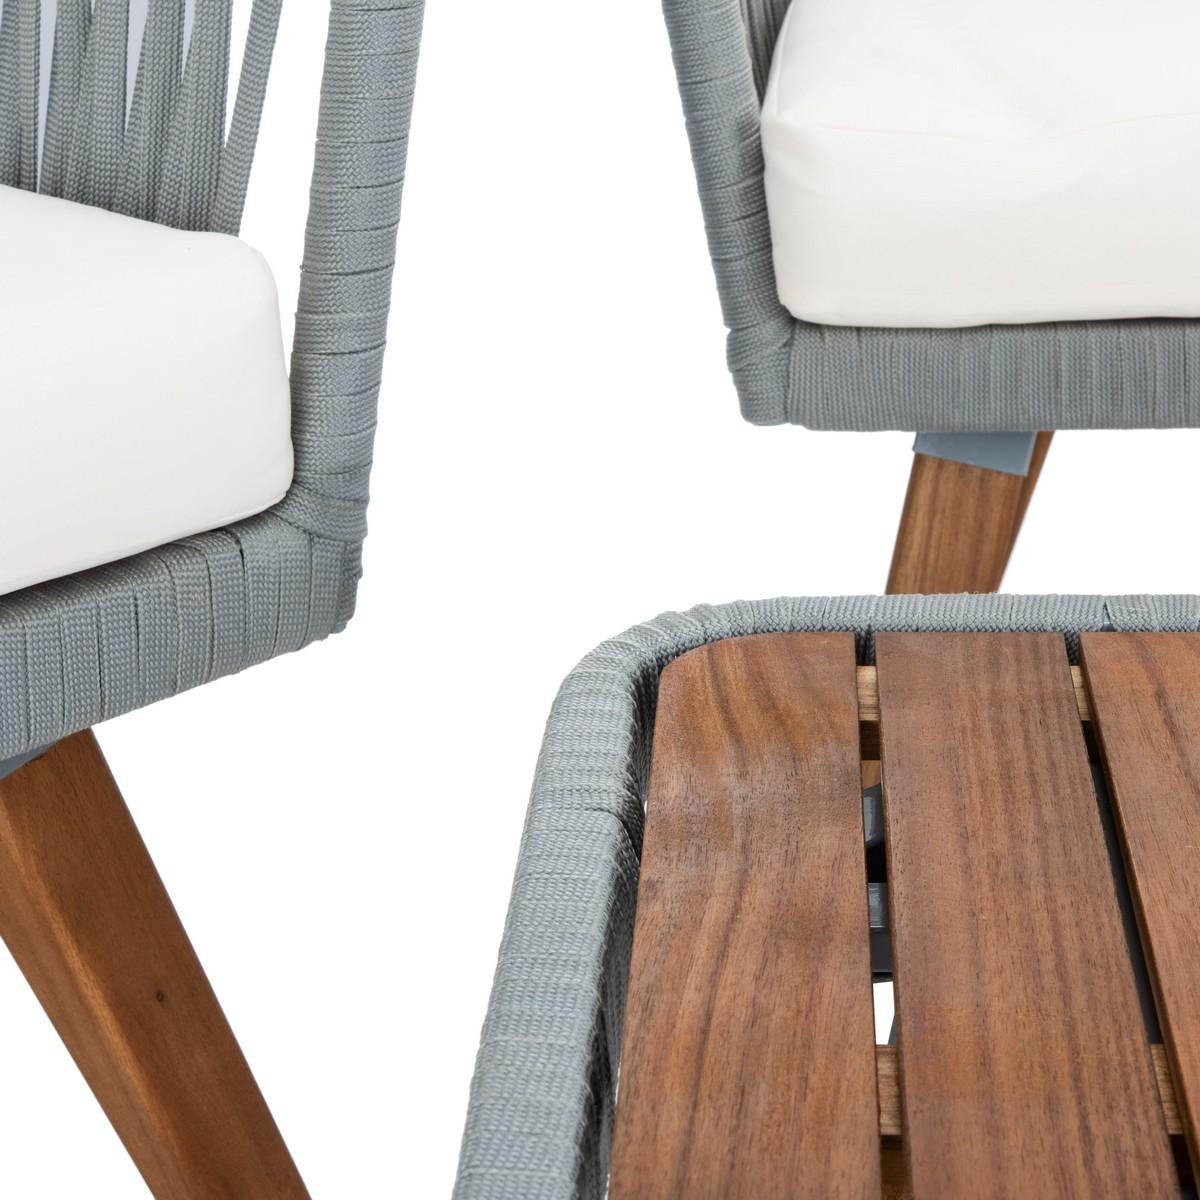 PAT7074A Patio Sets - 4 Piece - Furniture by Safavieh on Safavieh Ransin id=30933